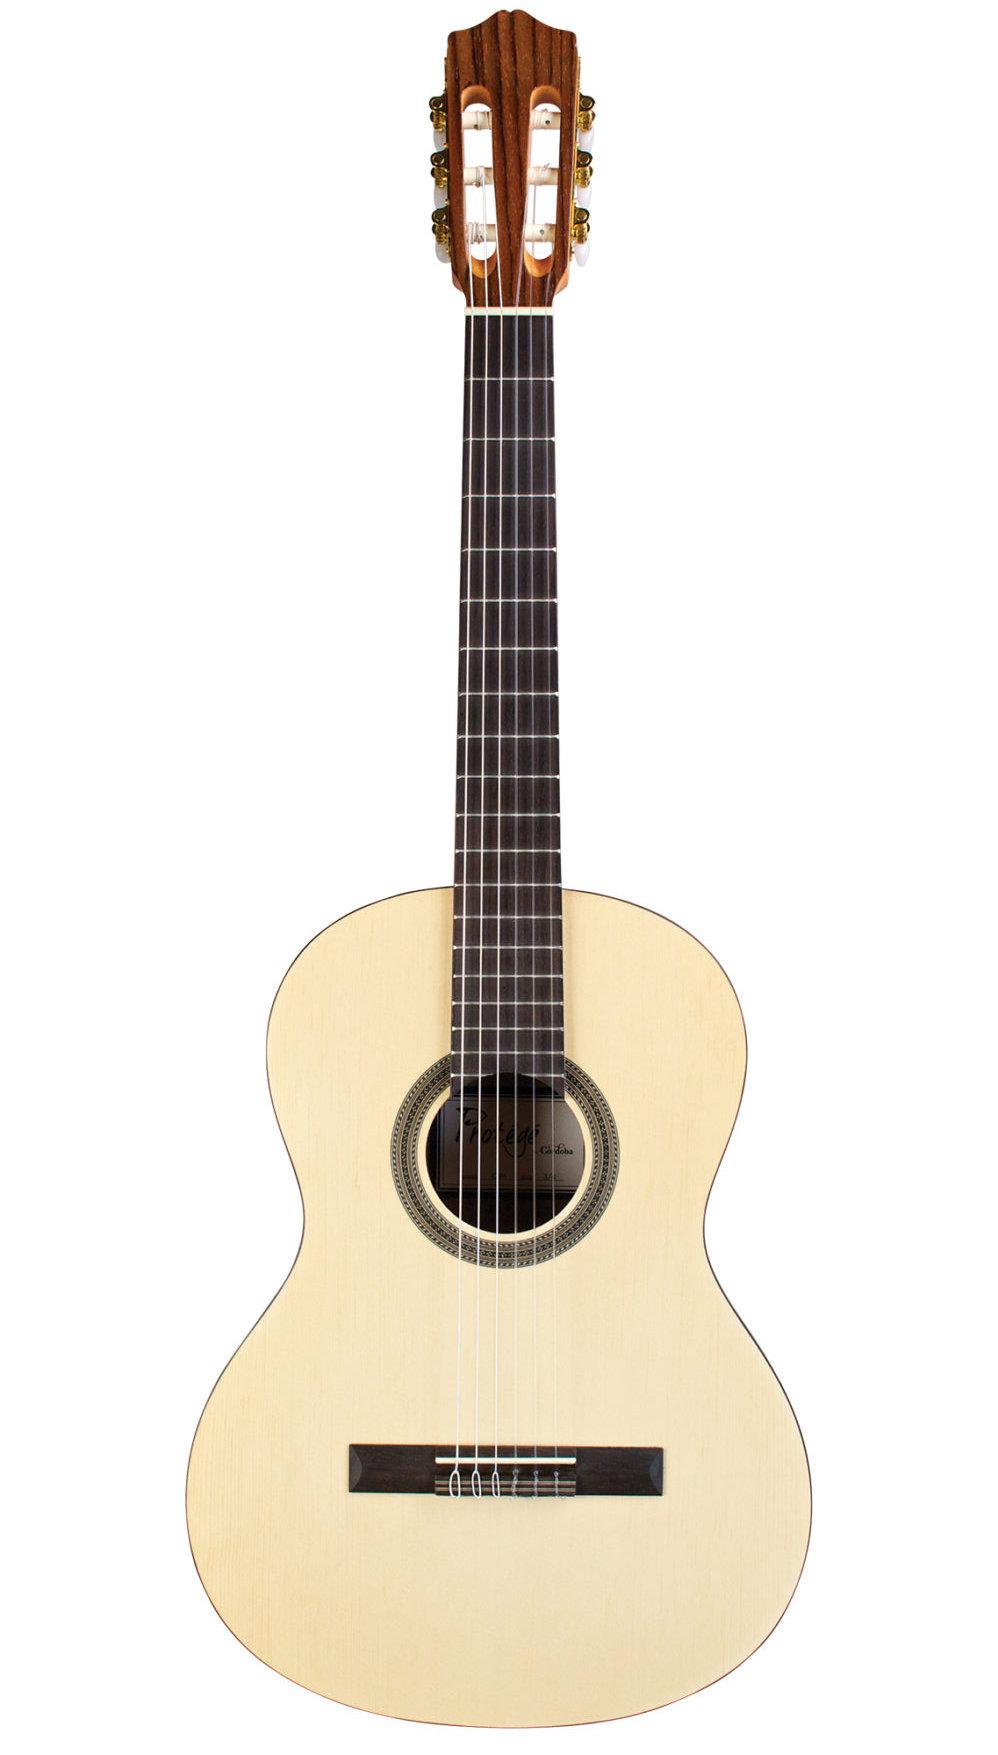 Spruce top Cordoba Protegé C1M ¾ Size Classical Guitar